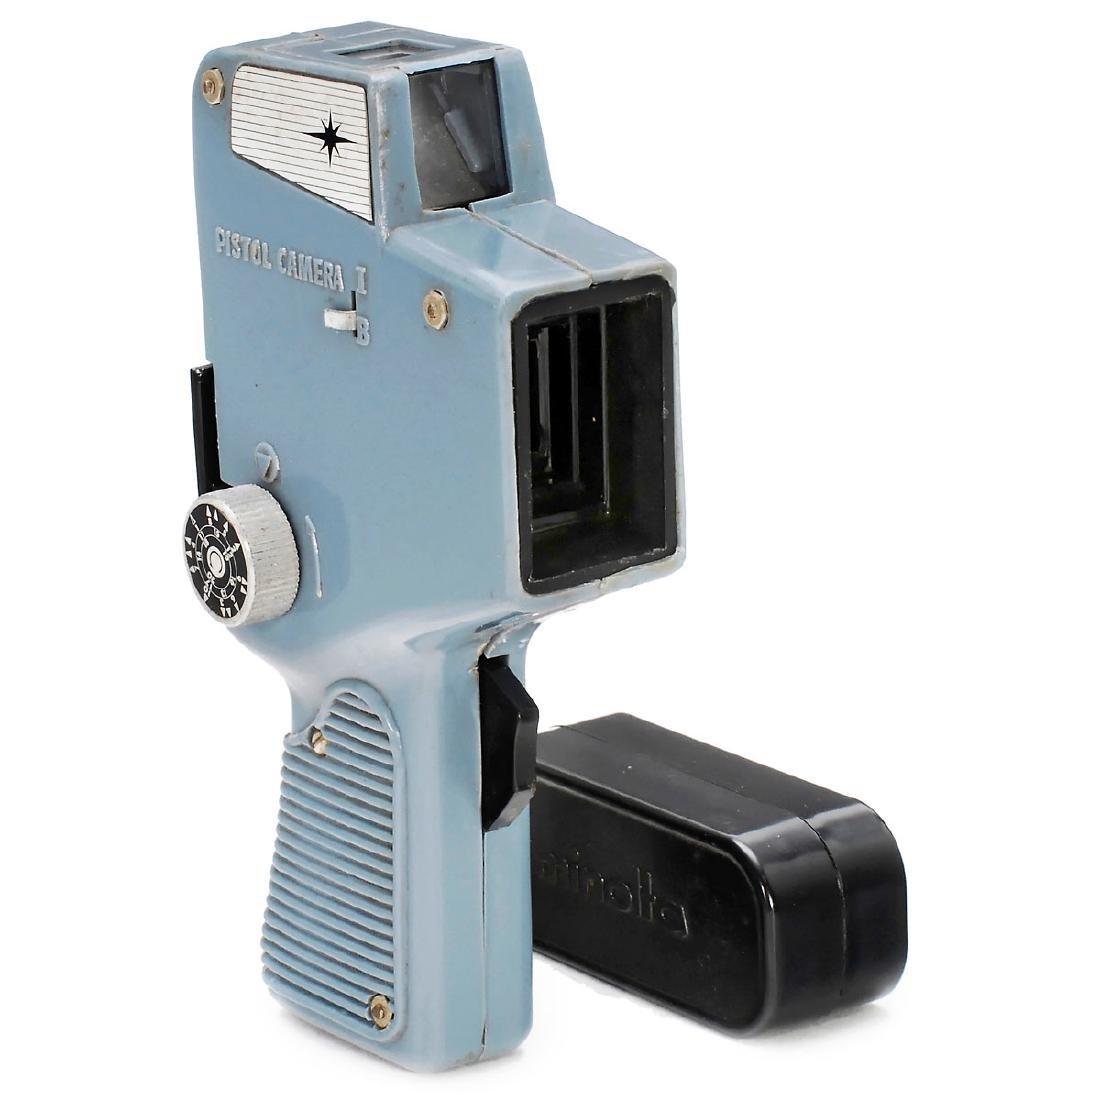 "Extremely Rare ""Glico Pistol Camera"", 1964"